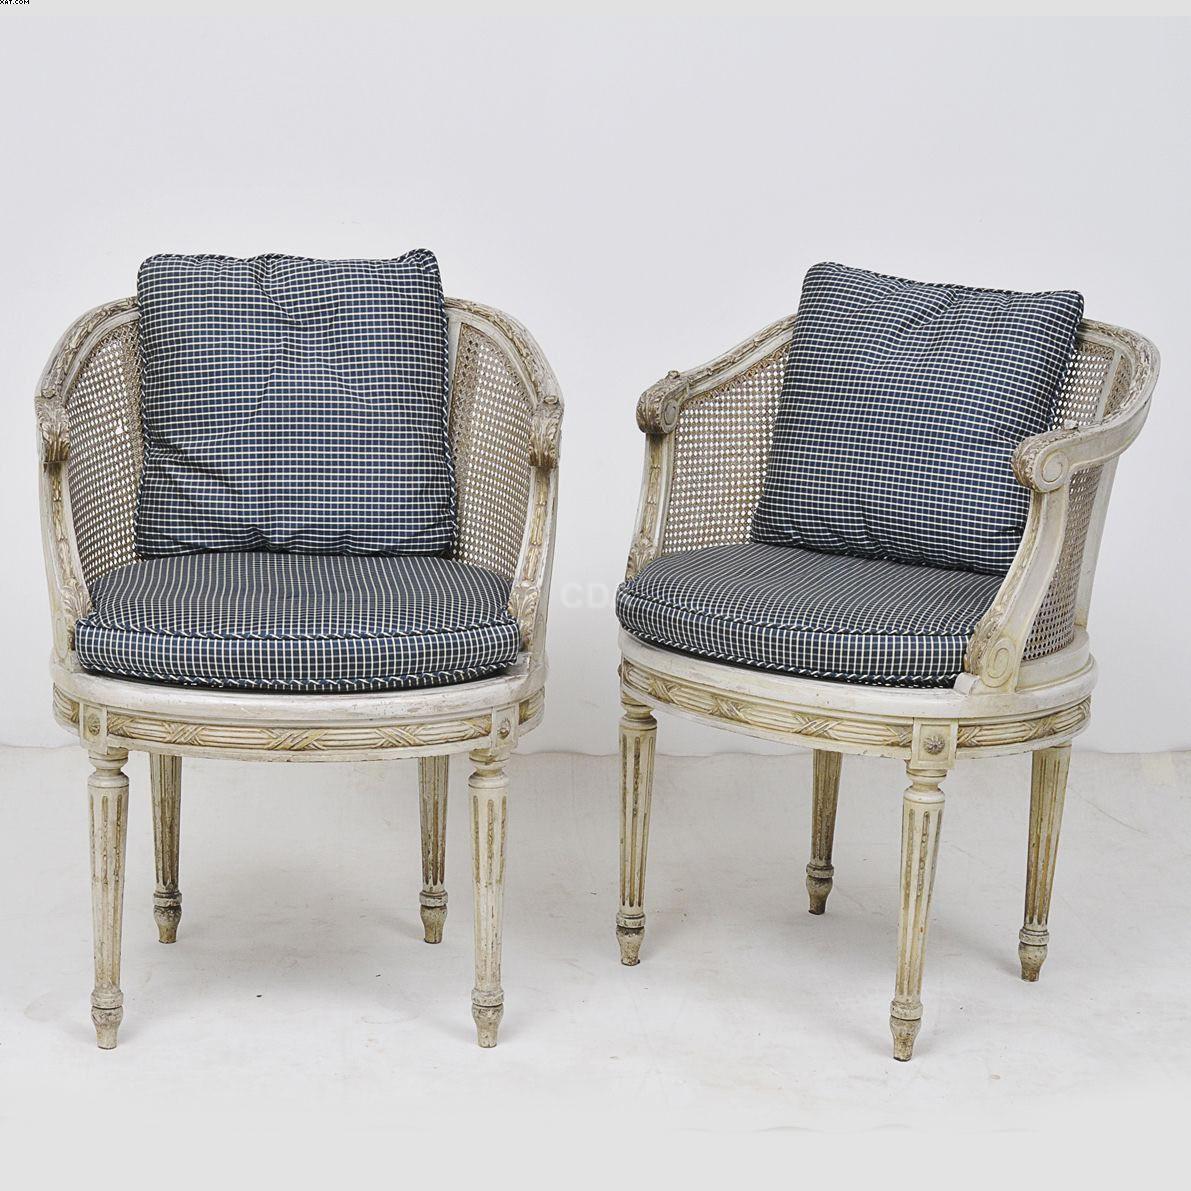 Par de graciosas cadeiras francesas Louis XVI